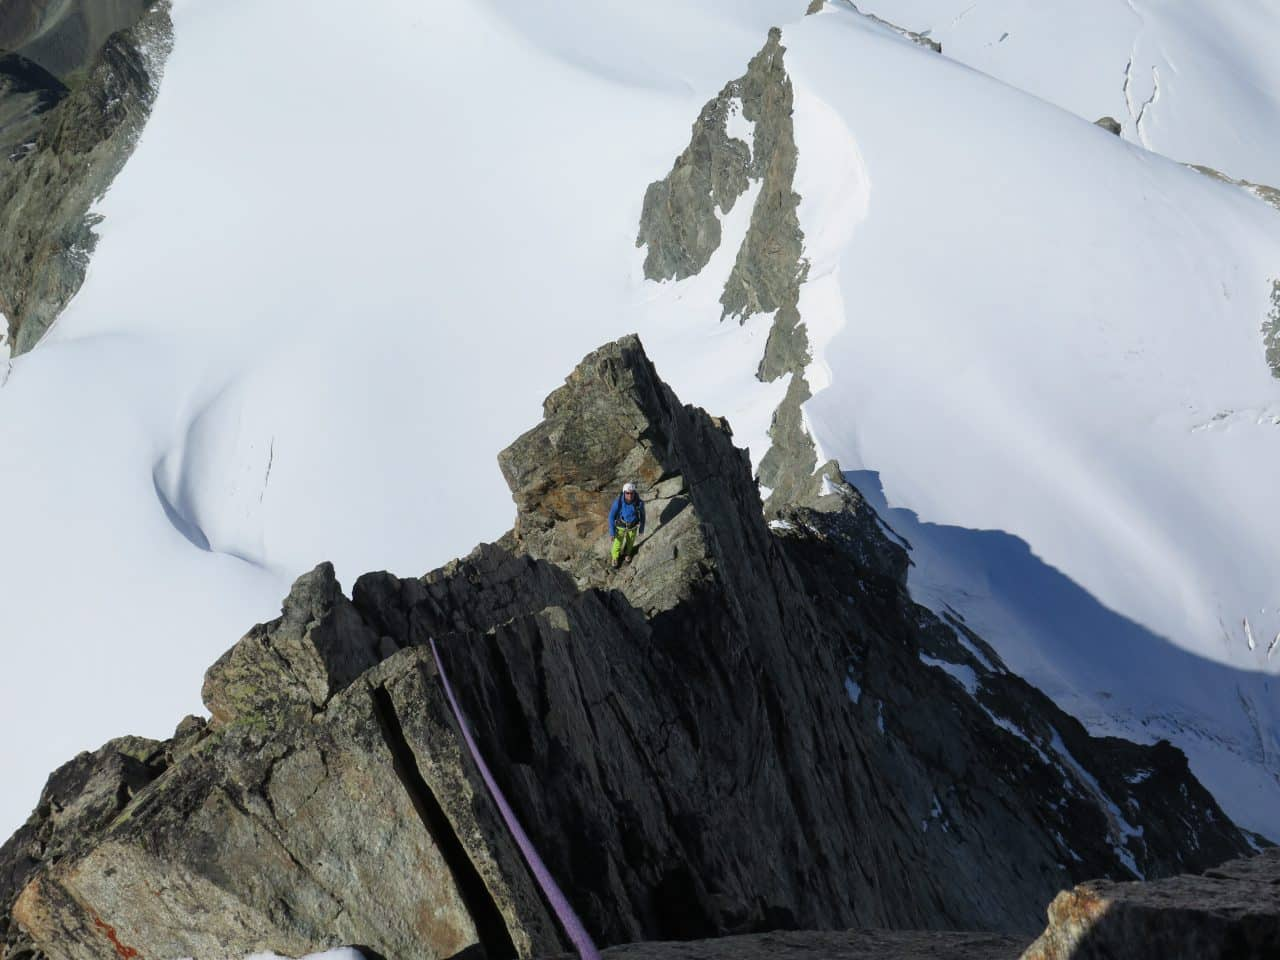 Arete-sud-ouest-eveque-arolla-valais-xavier-carrard-helyum-guide-de-montagne